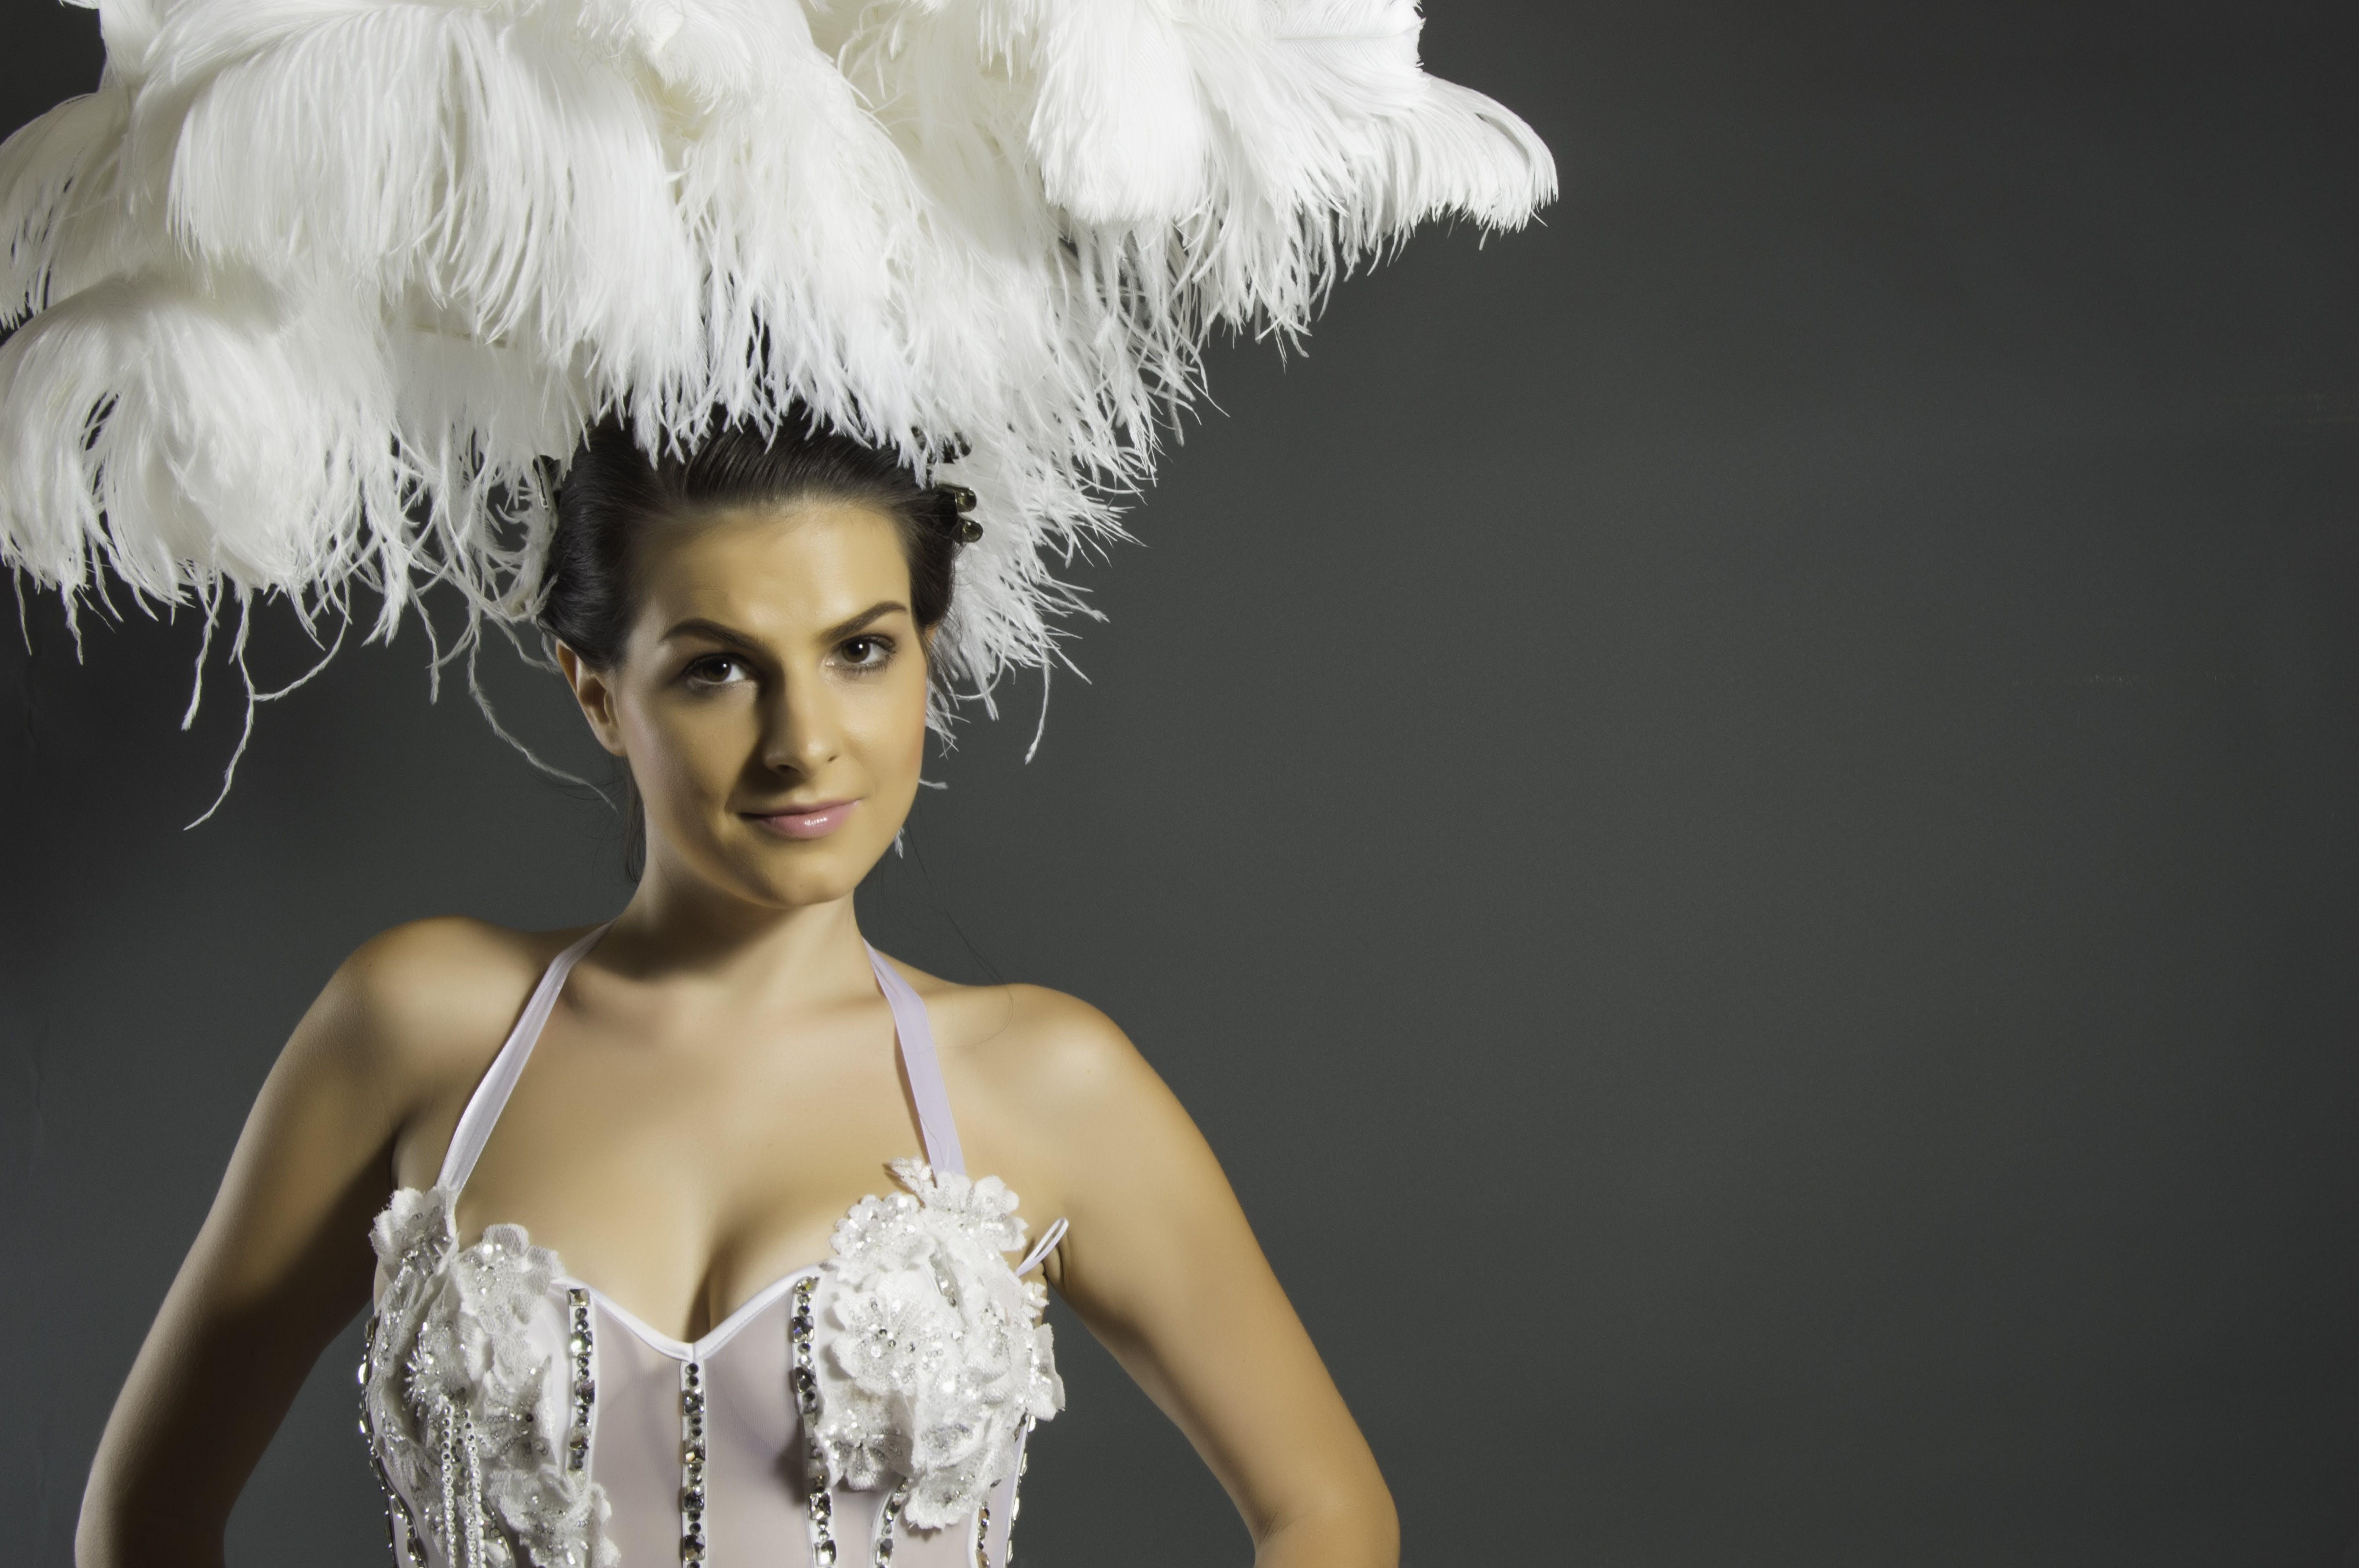 Woman With White Sleeveless Dress